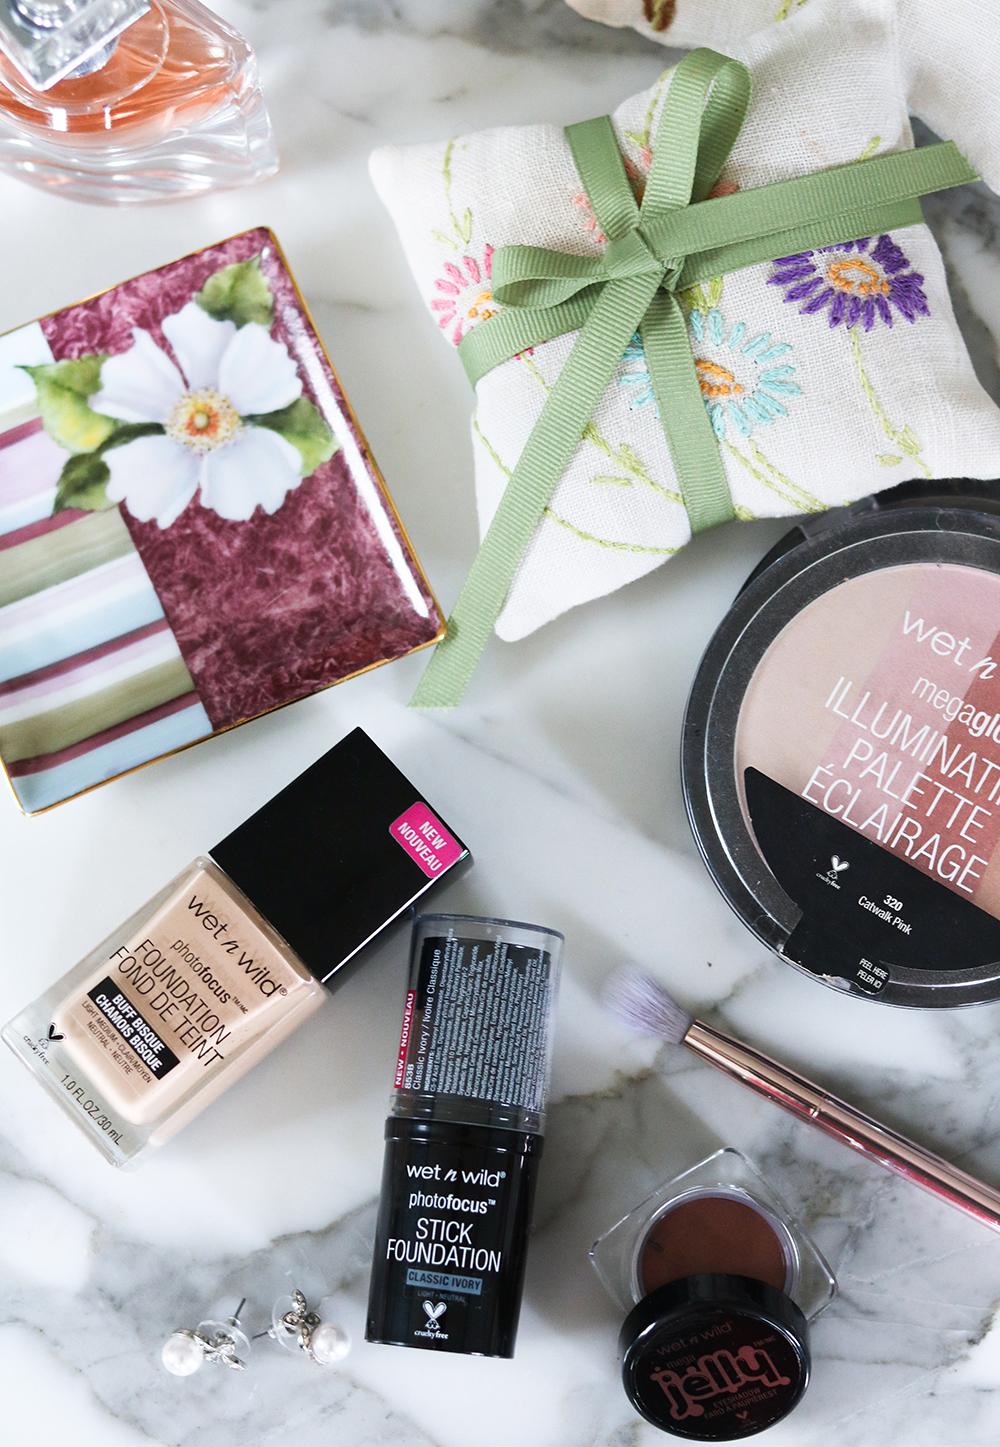 Wet n Wild Photo Focus Stick Foundation Review I DreaminLace.com #DrugstoreMakeup #beautytips #crueltyfree